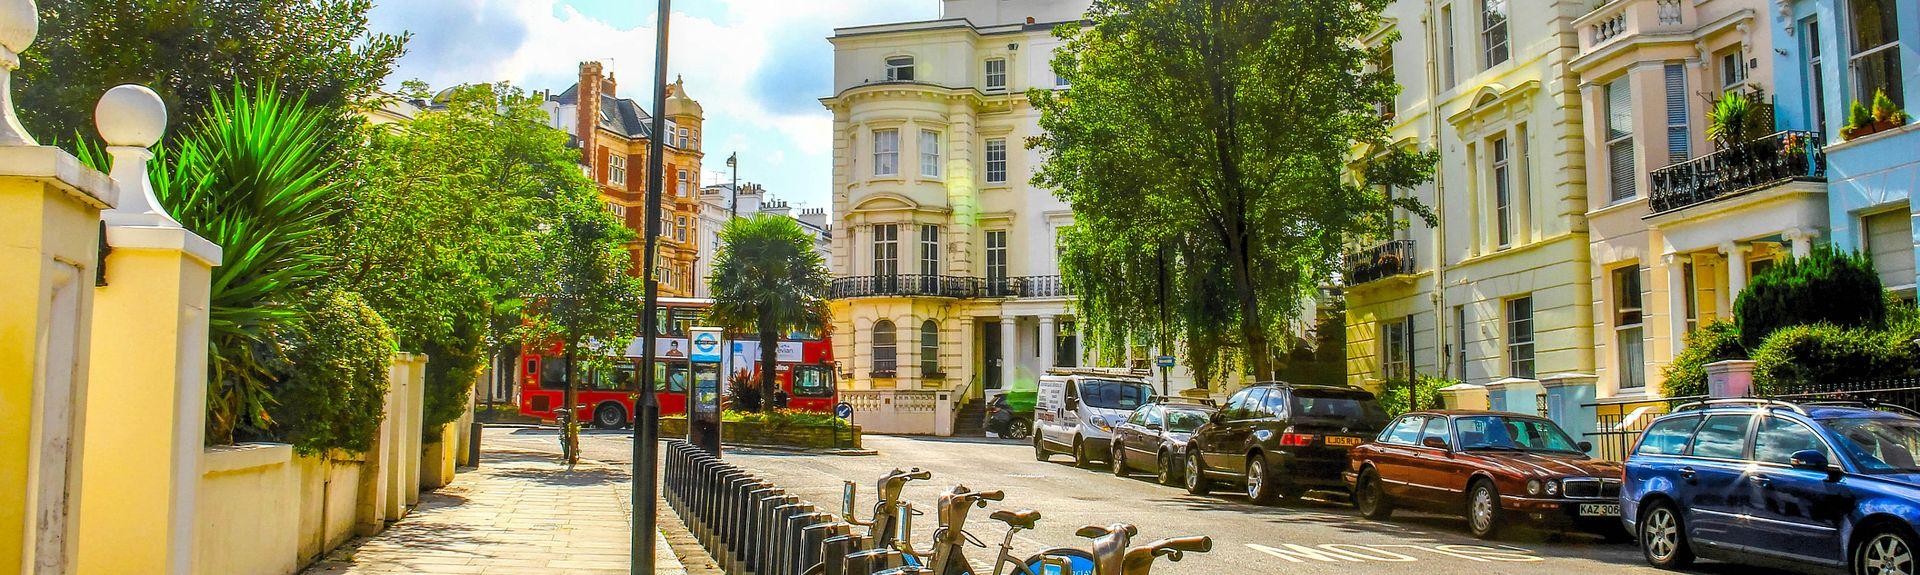 IKensington & Chelsea | Uber destinations for Uber Drivers London